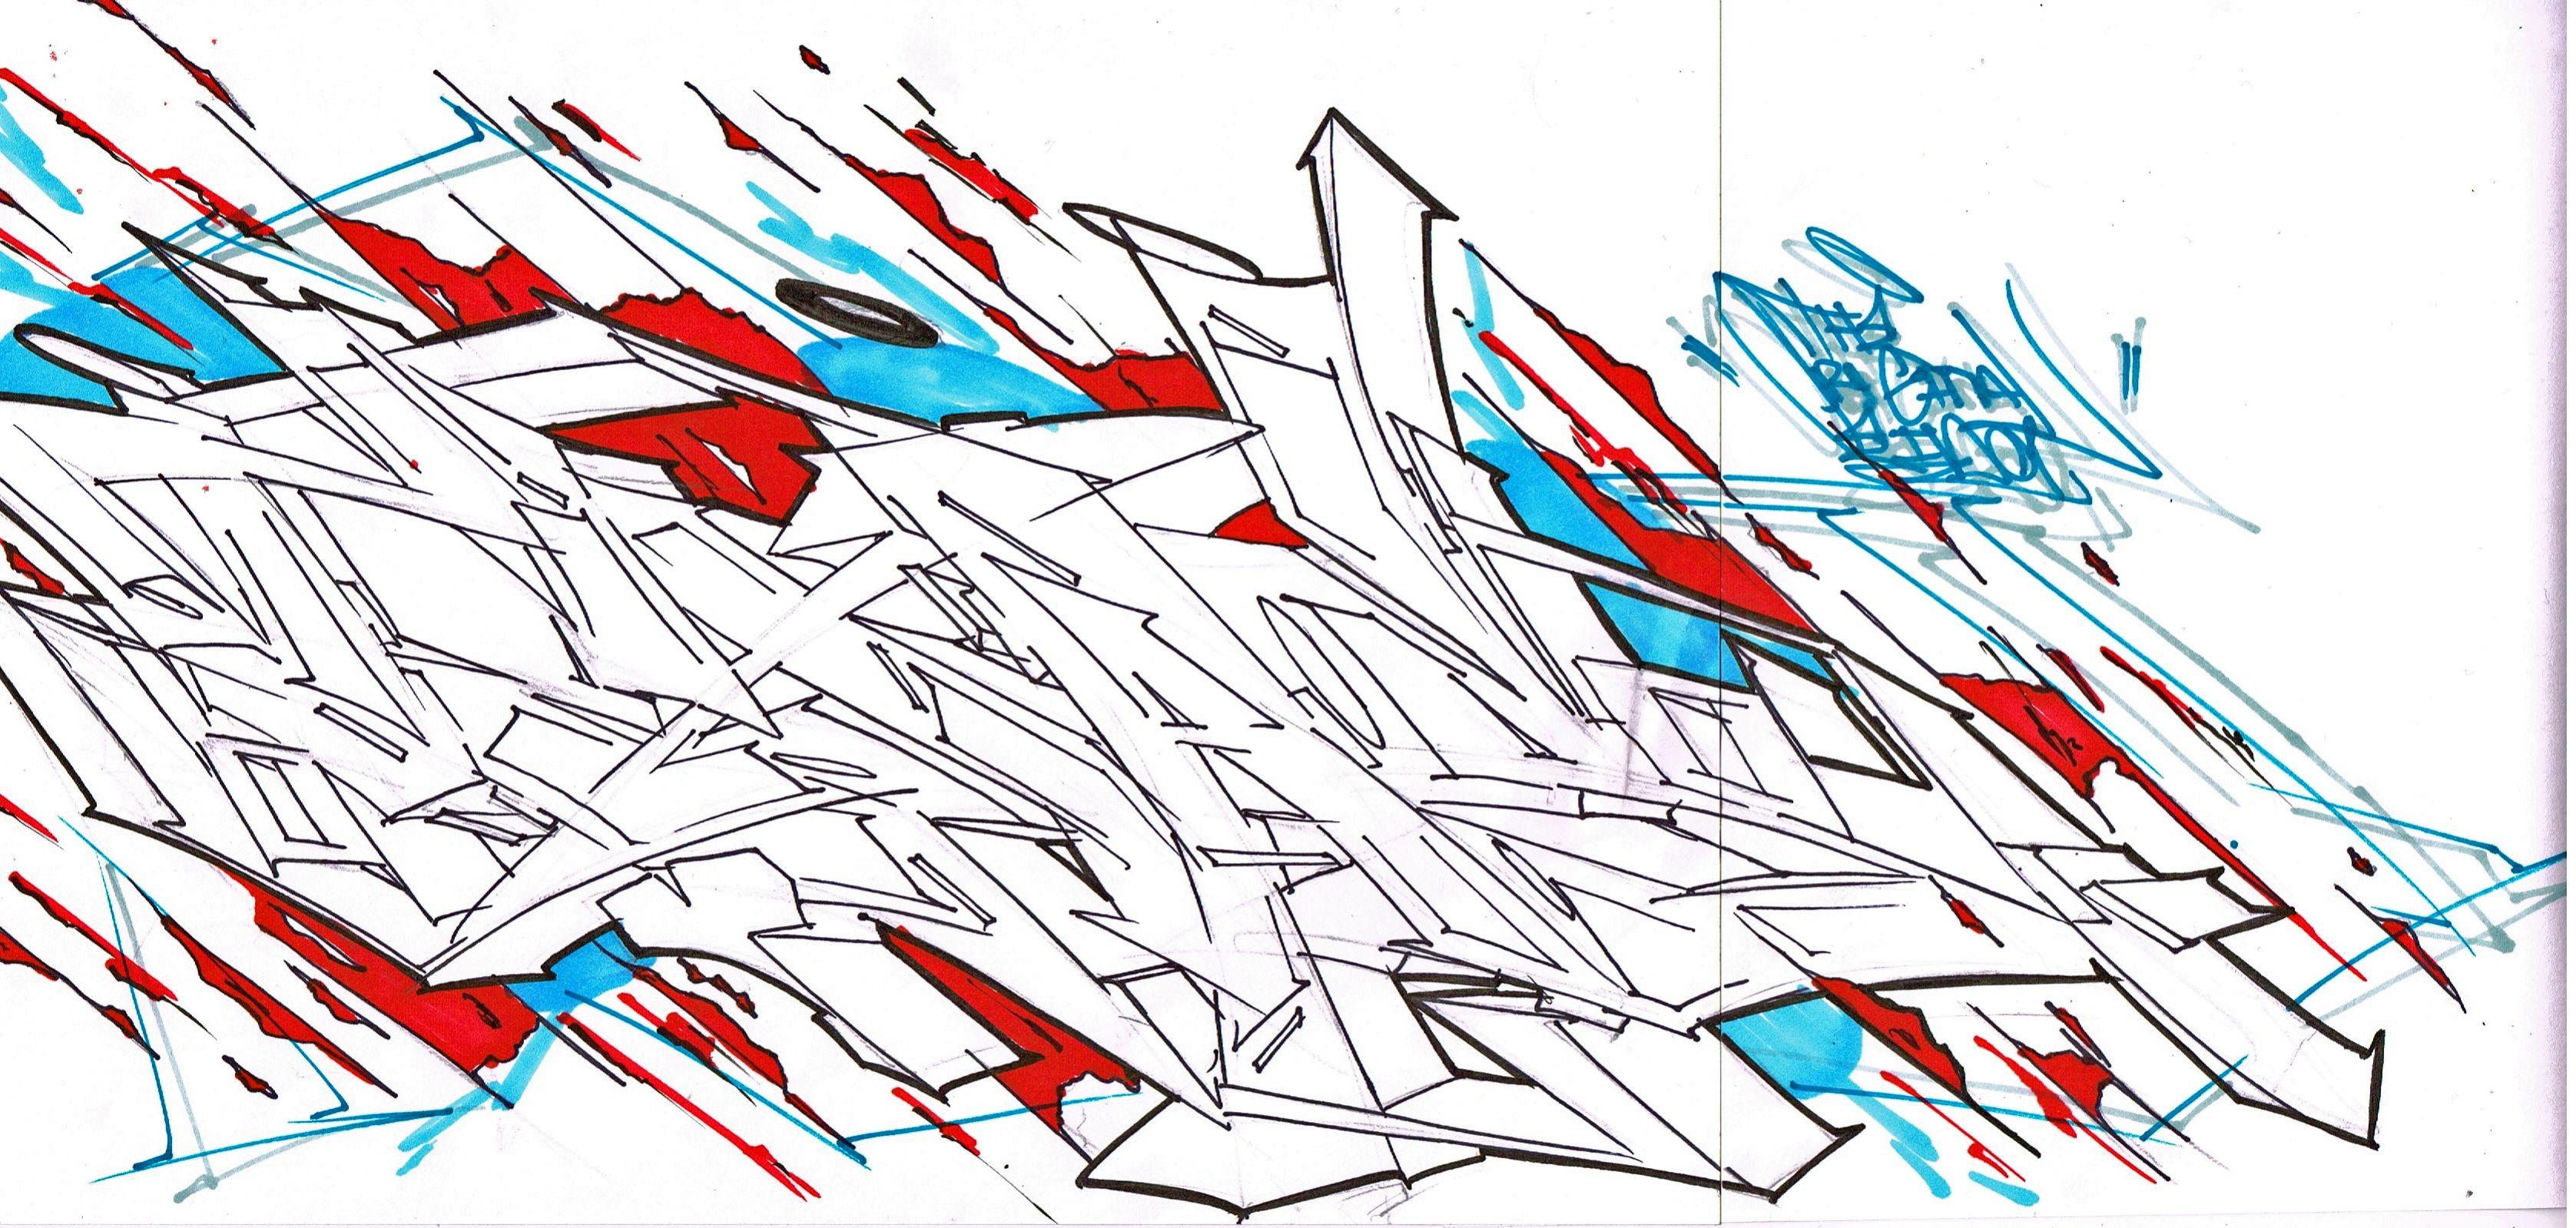 ai.imgur.com_18UzrYX.jpg